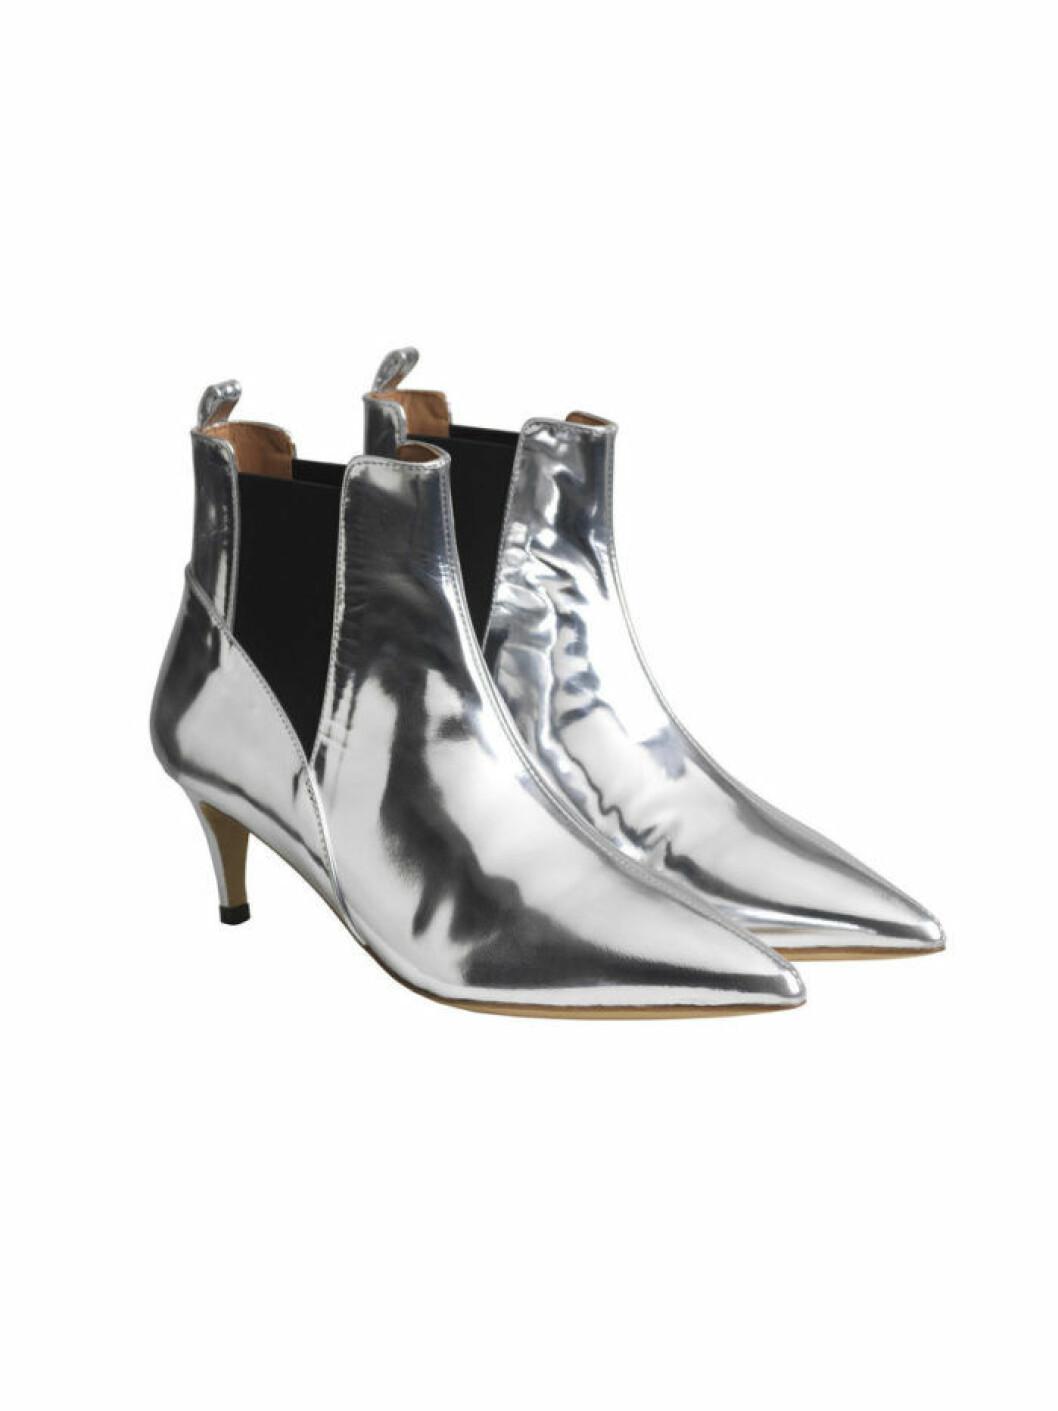 Silver boots fran By Malene Birger